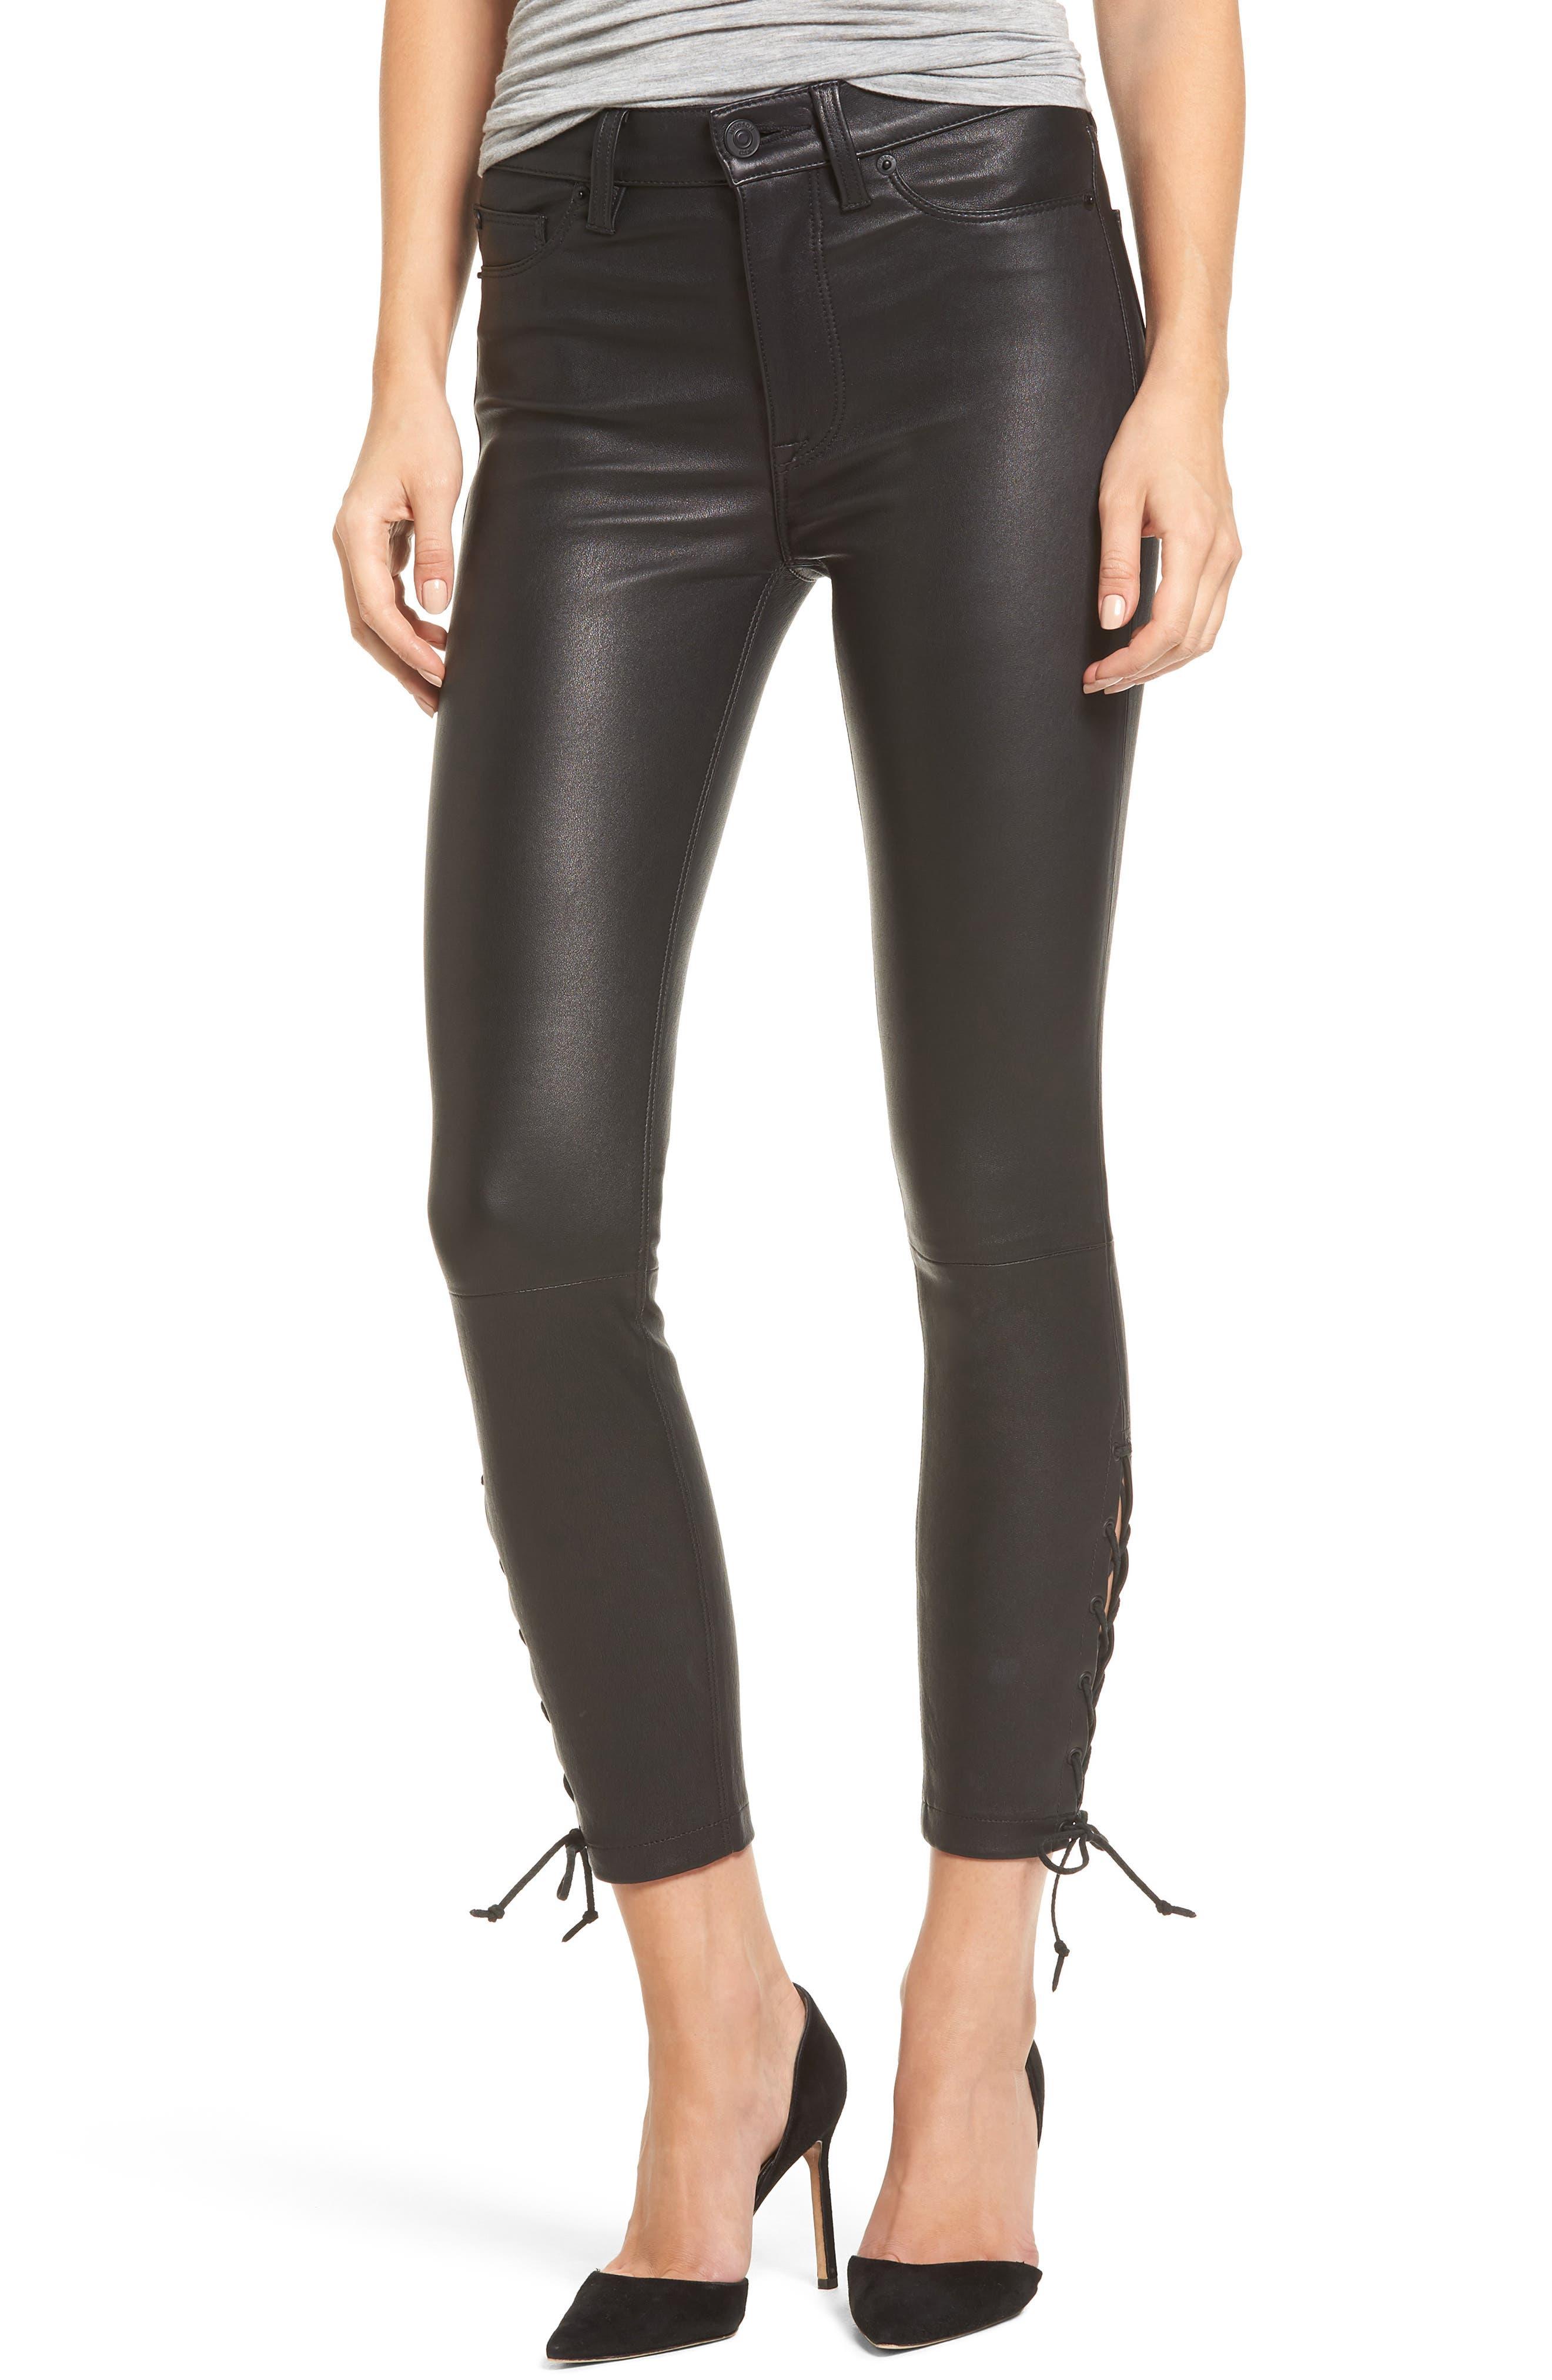 Nix High Waist Leather Skinny Pants,                             Main thumbnail 1, color,                             001